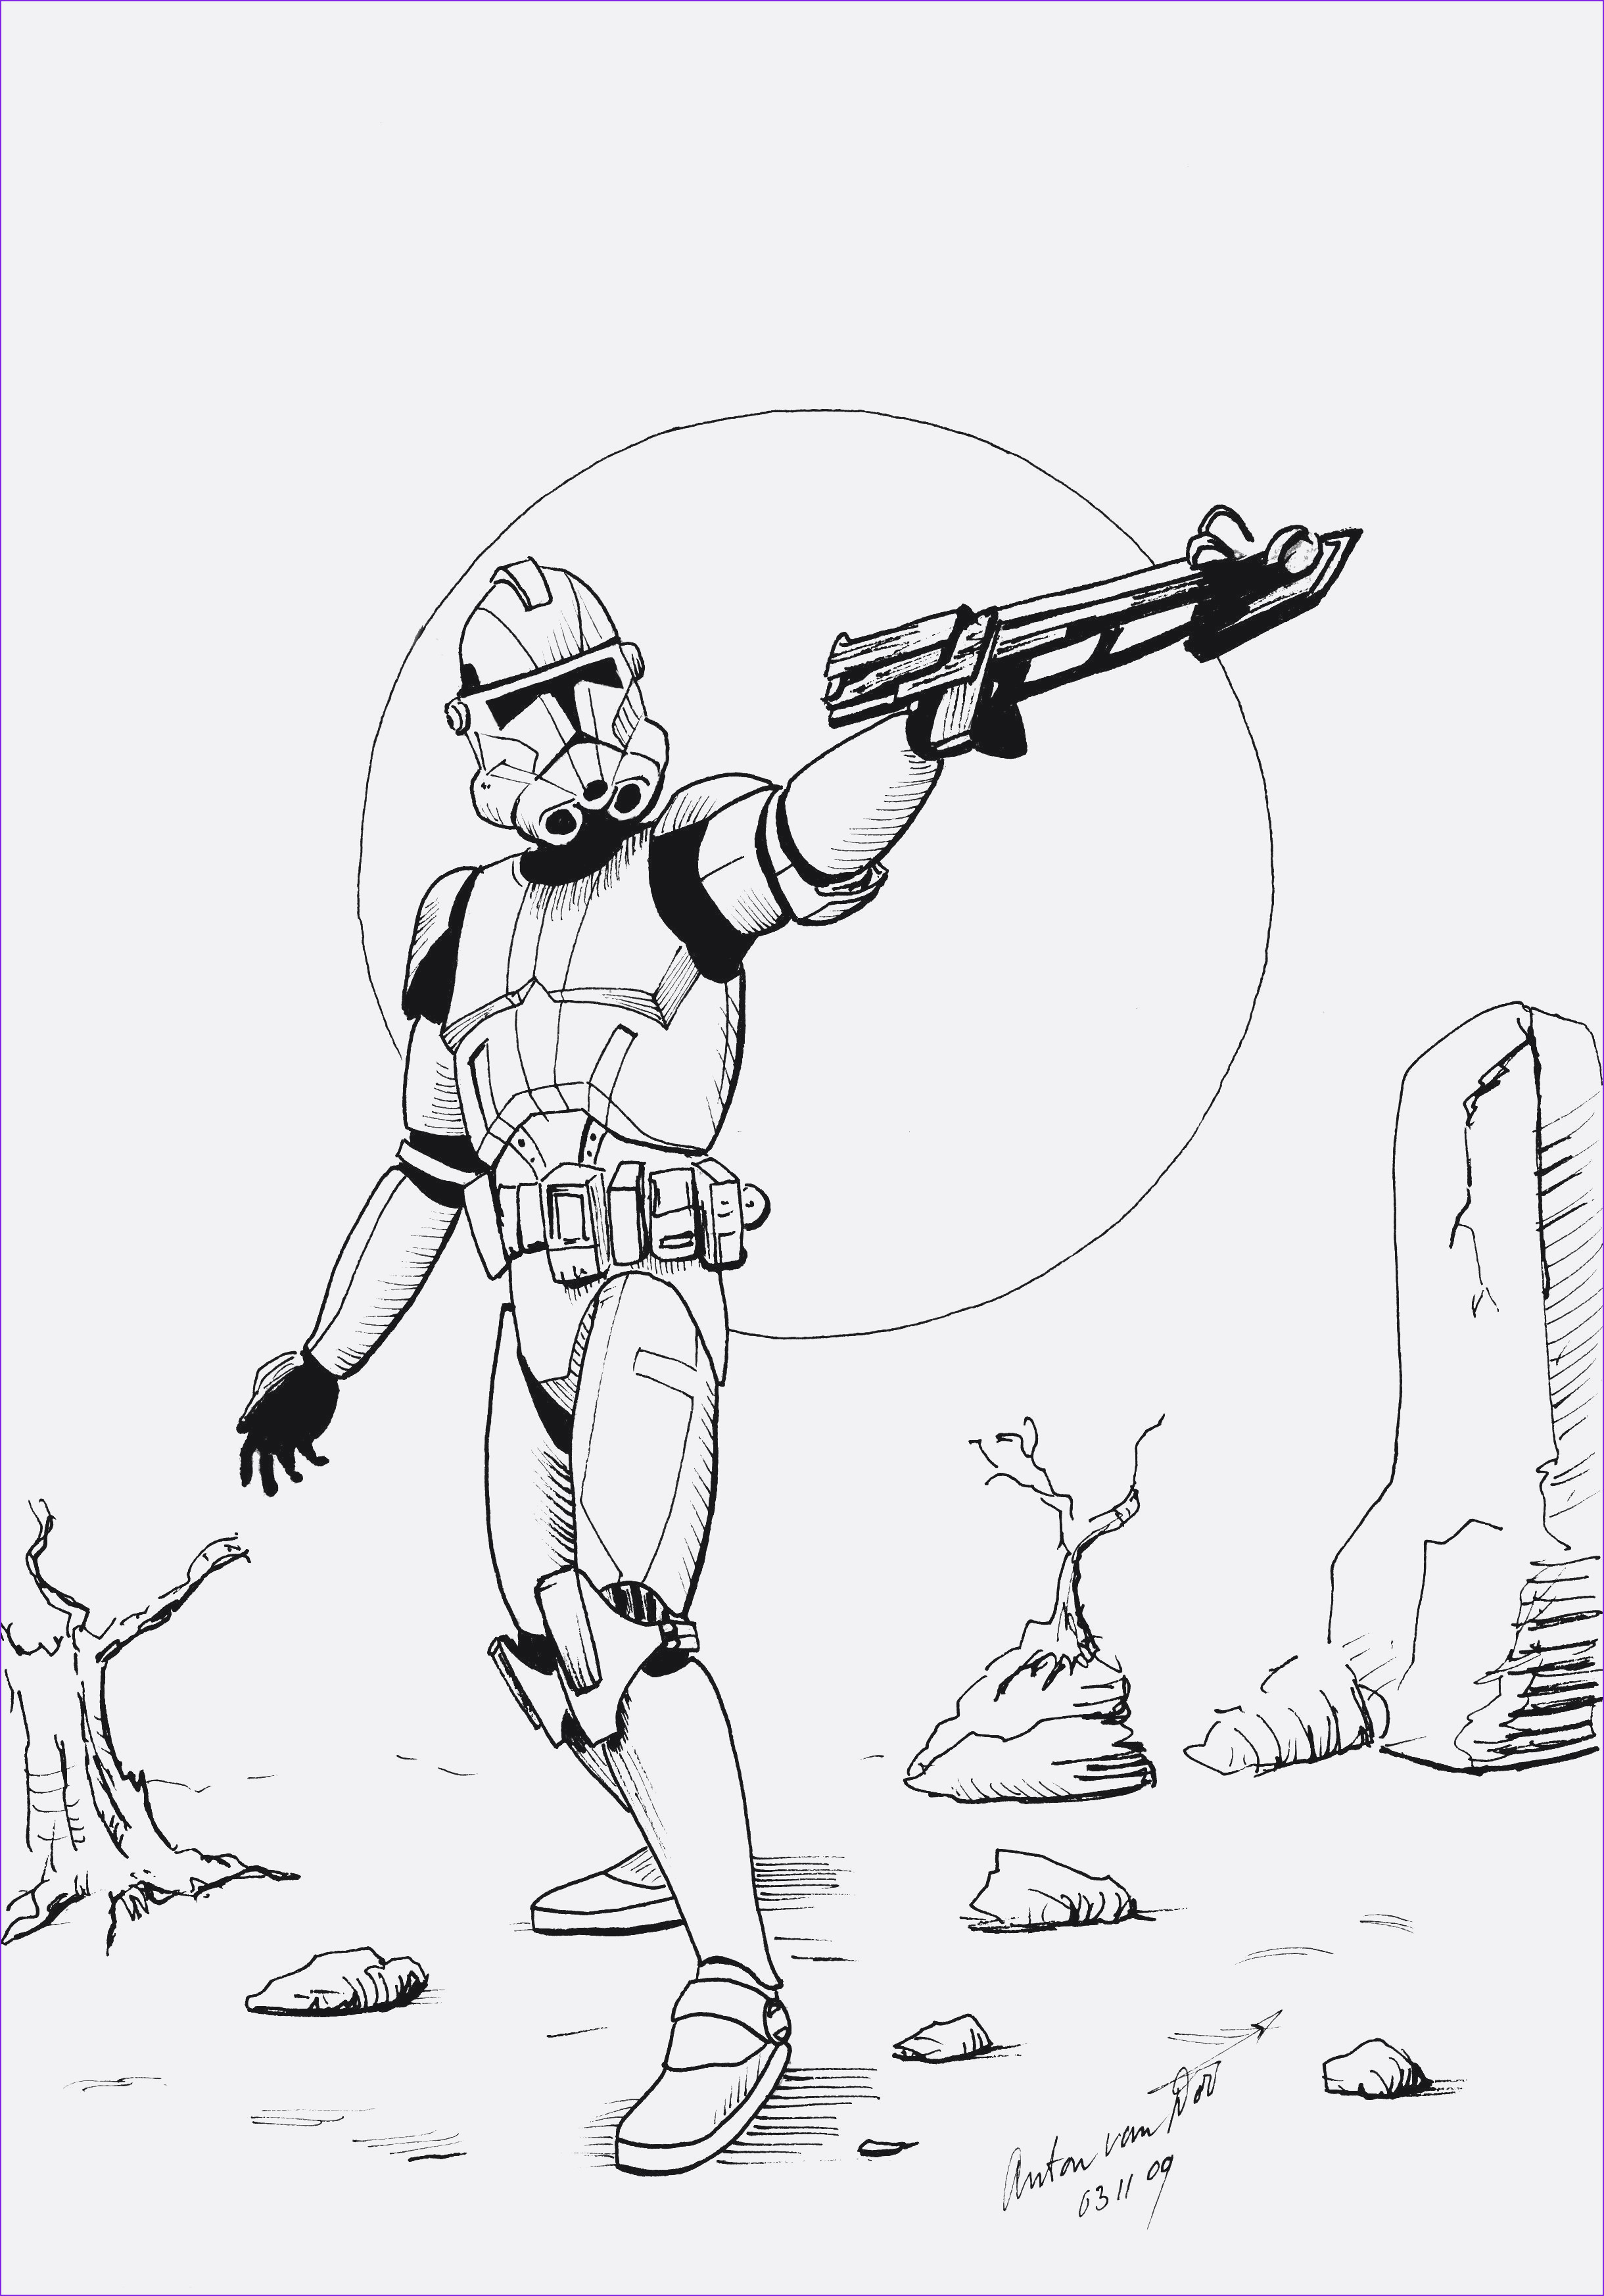 Star Wars the Clone Wars Ausmalbilder Genial Star Wars the Clone Wars Coloring Pages to Print Coloring Pages Stock